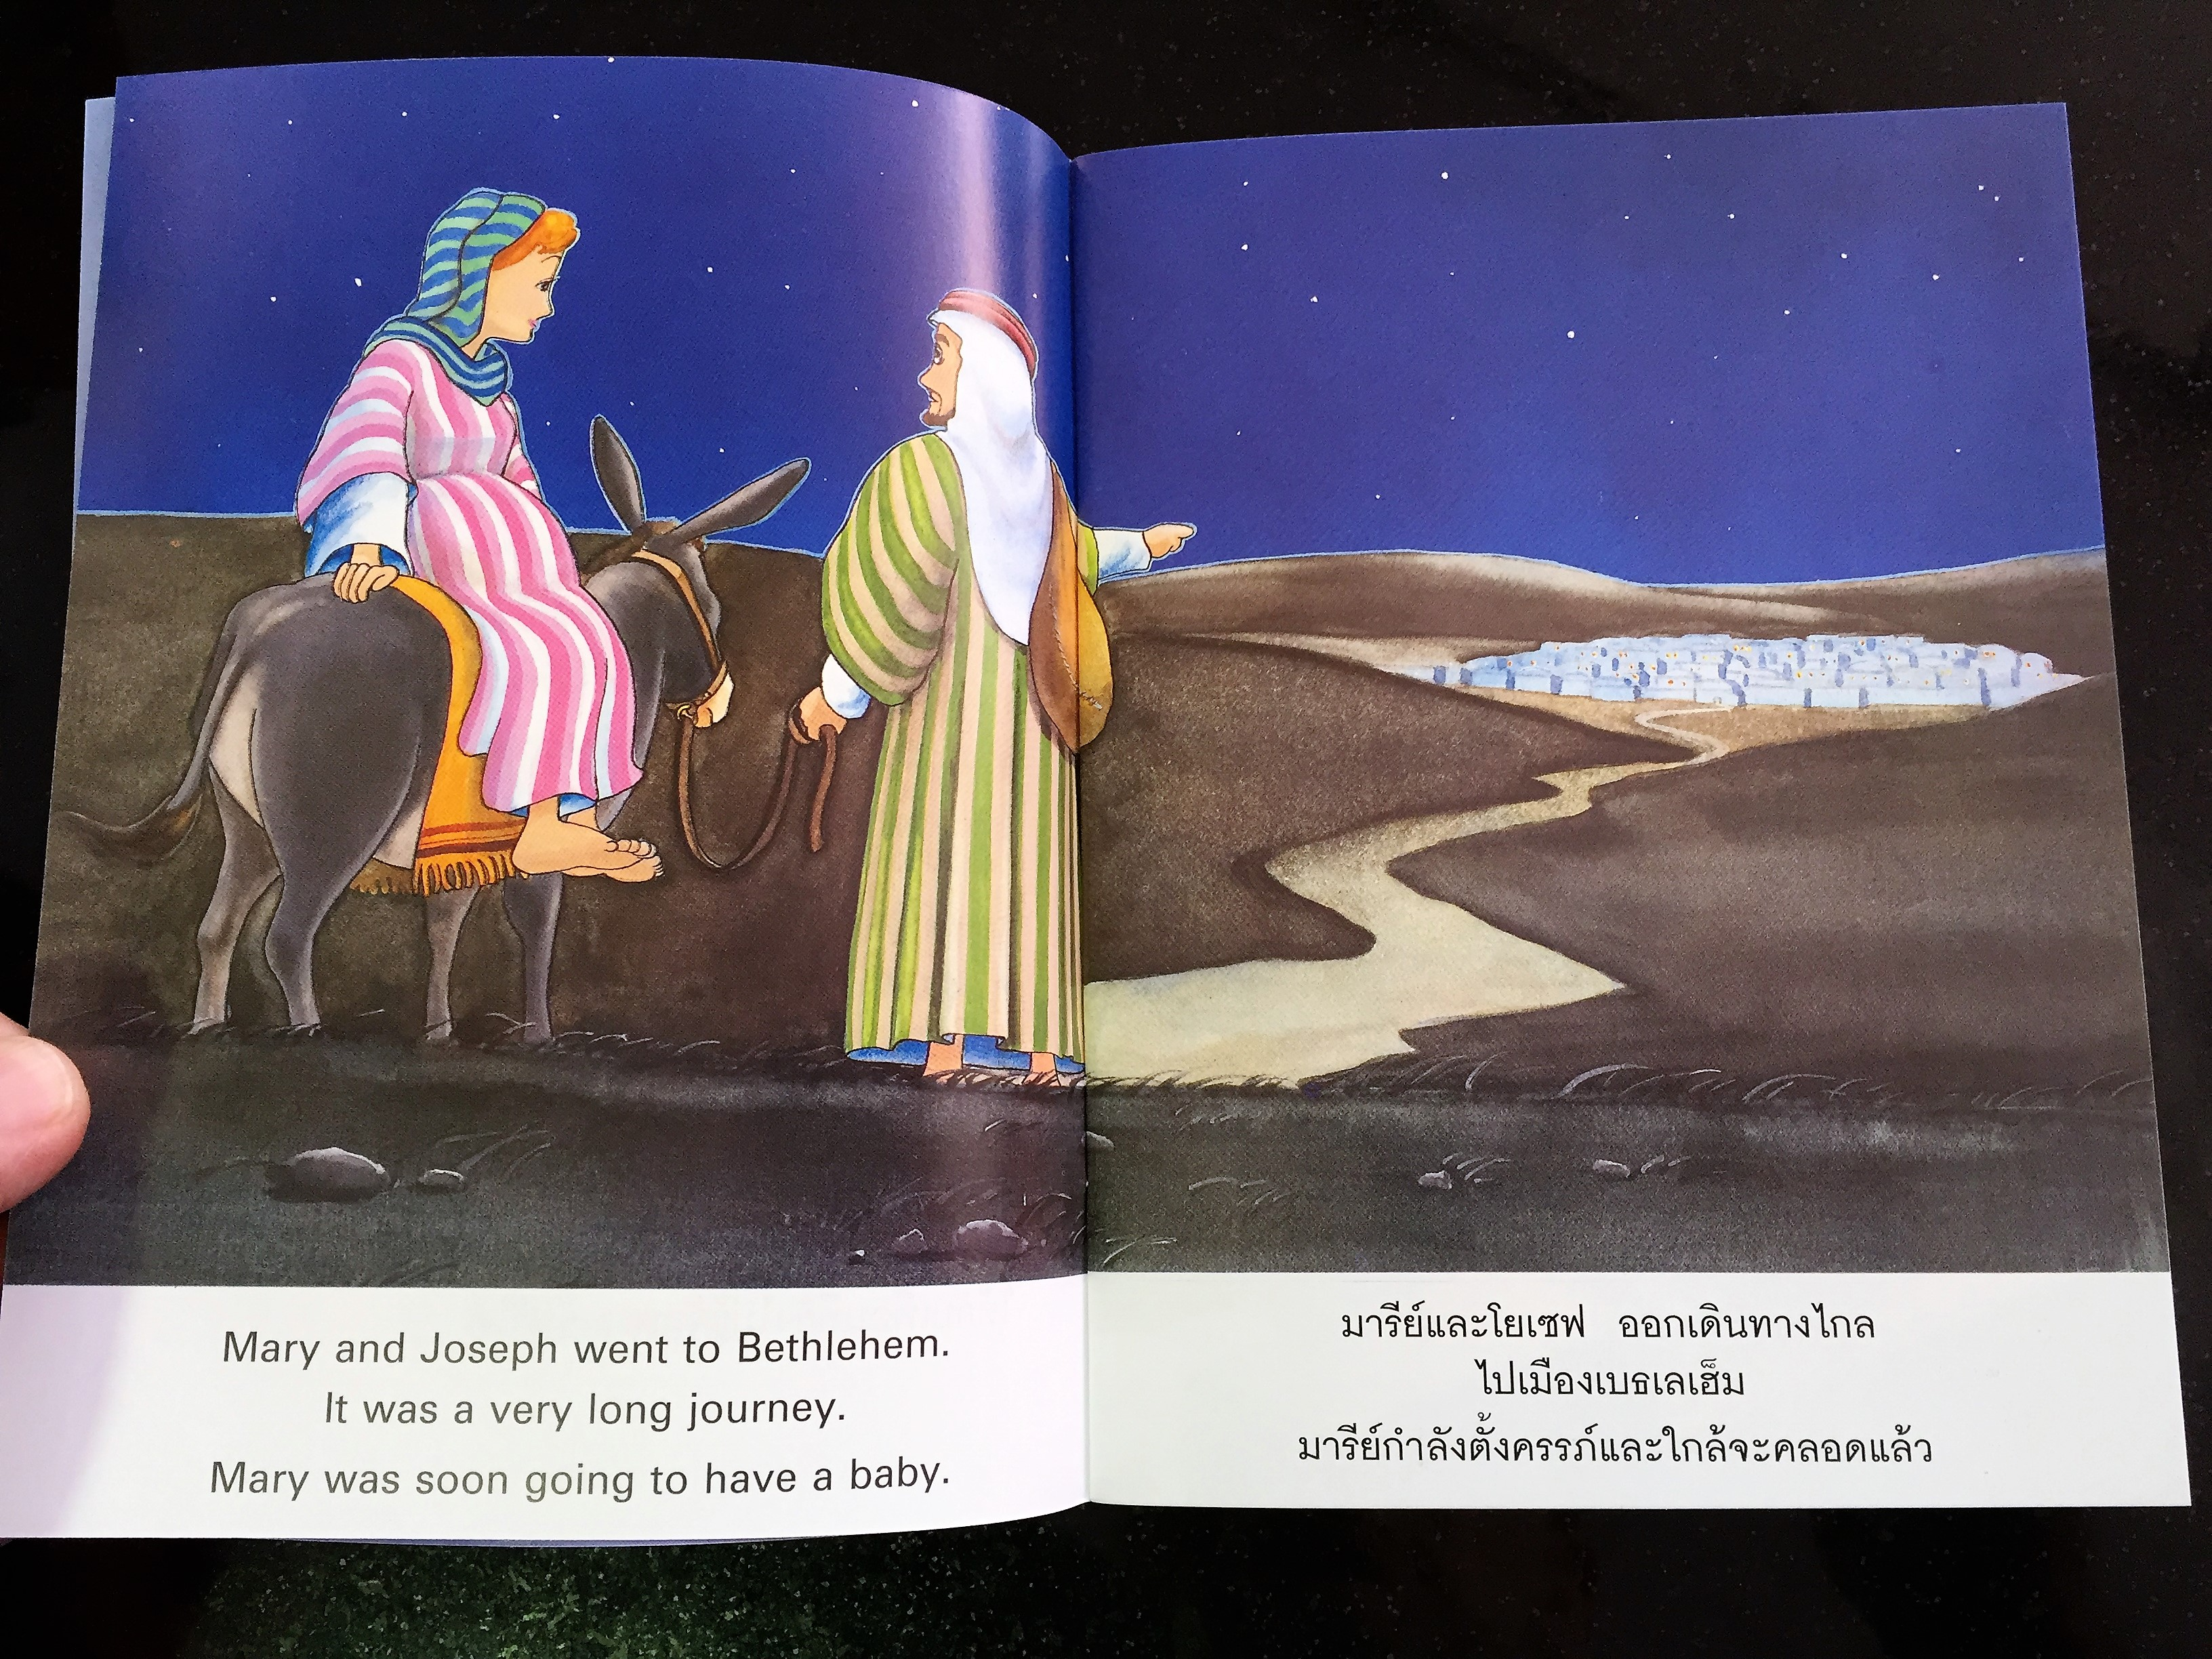 jesus-is-born-thai-english-bible-storybook-for-children-4-.jpg